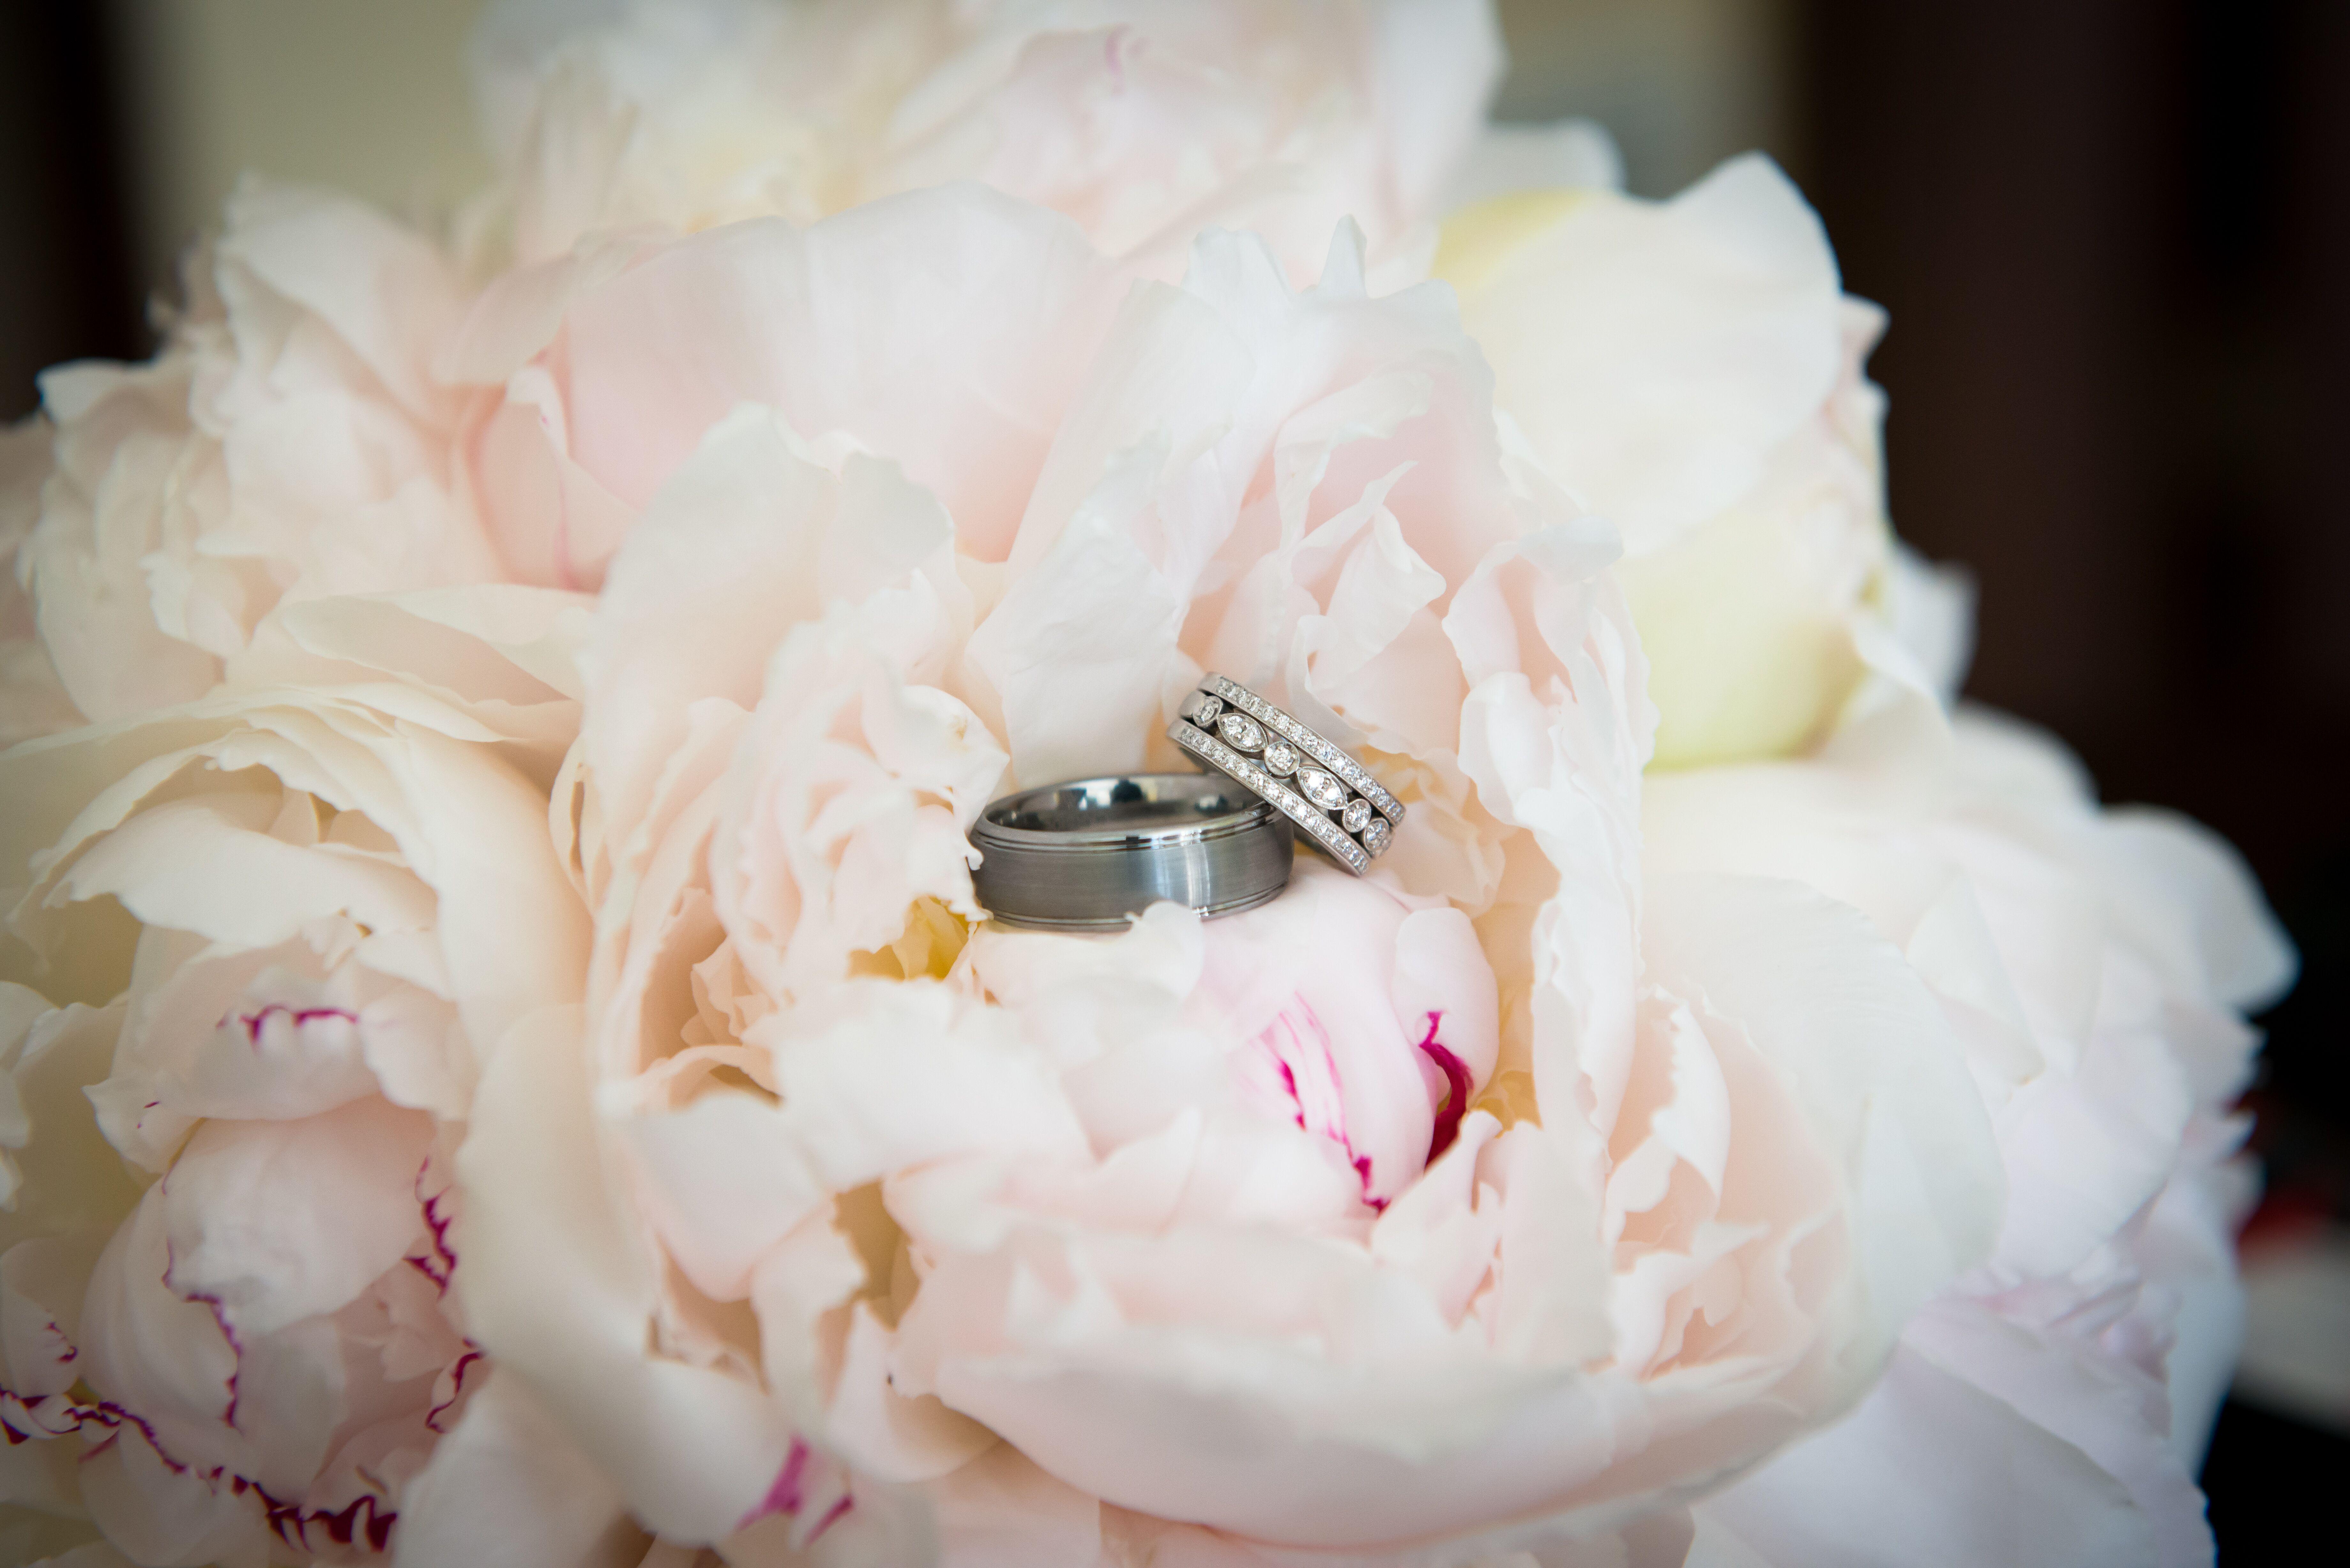 Dorable Mini Champagne Wedding Favors Sketch - The Wedding Ideas ...